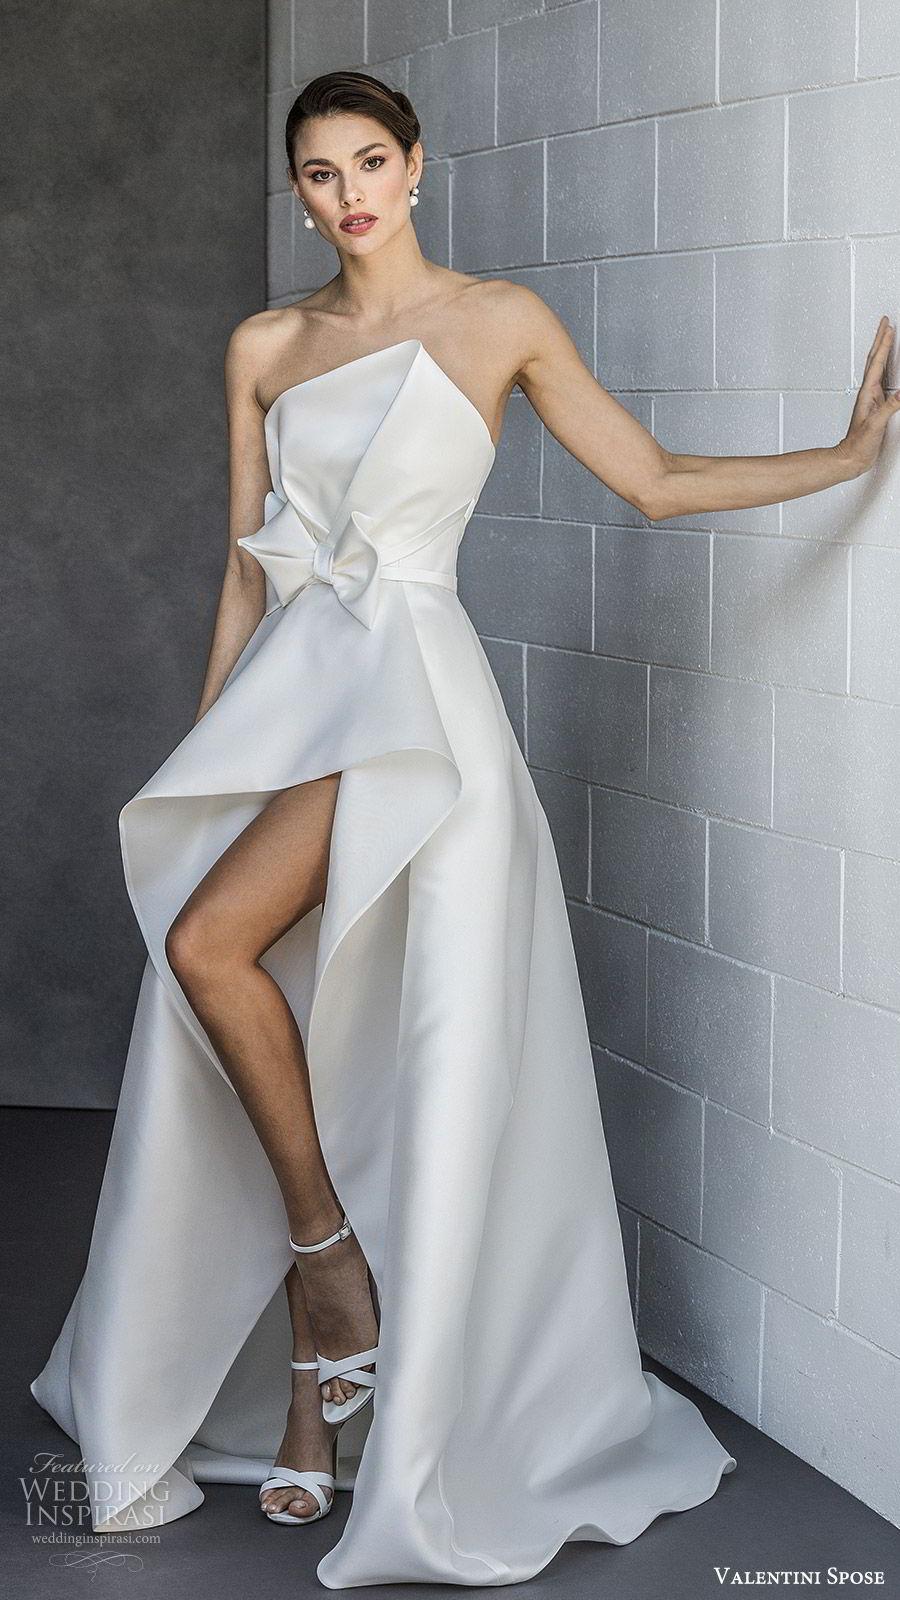 valentini spose spring 2020 bridal strapless asymmetric neckline high low skirt a line wedding dress (2) bow waist modern clean minimalist mv